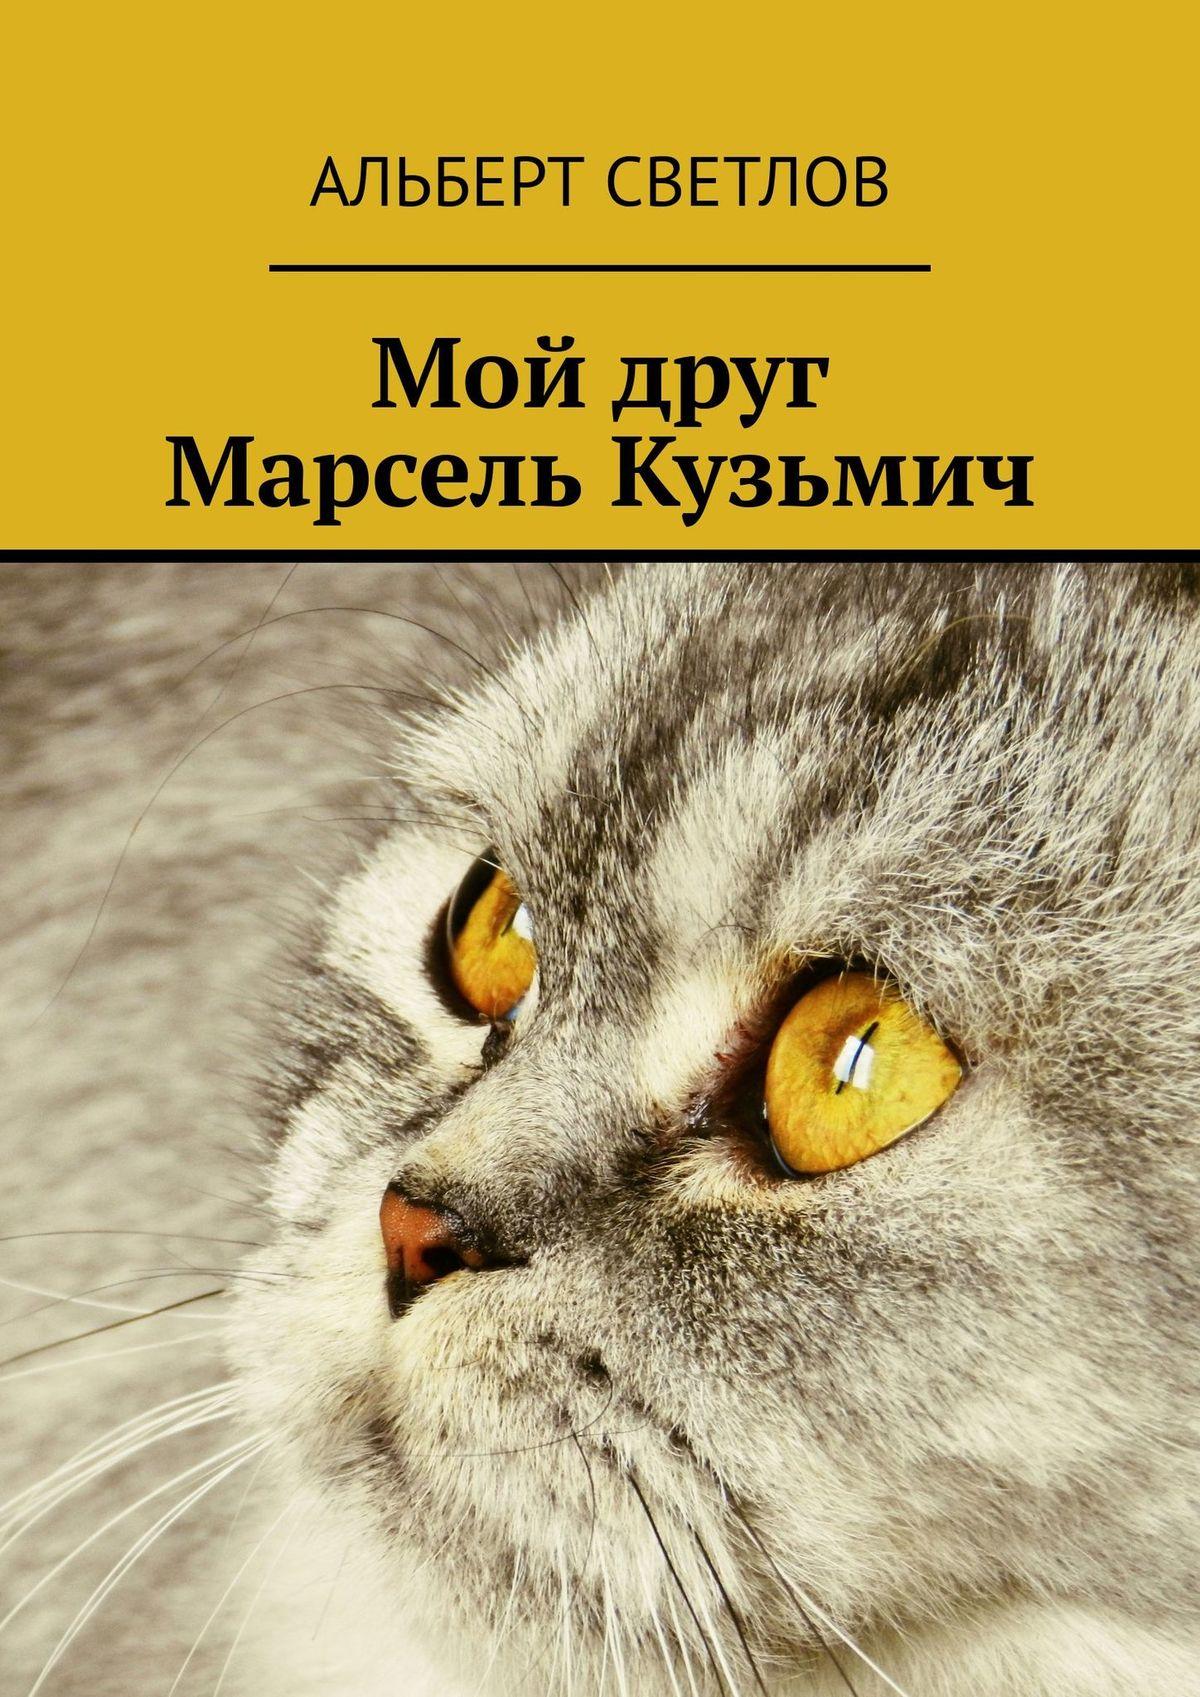 Альберт Светлов Кошки илюди люди и кошки